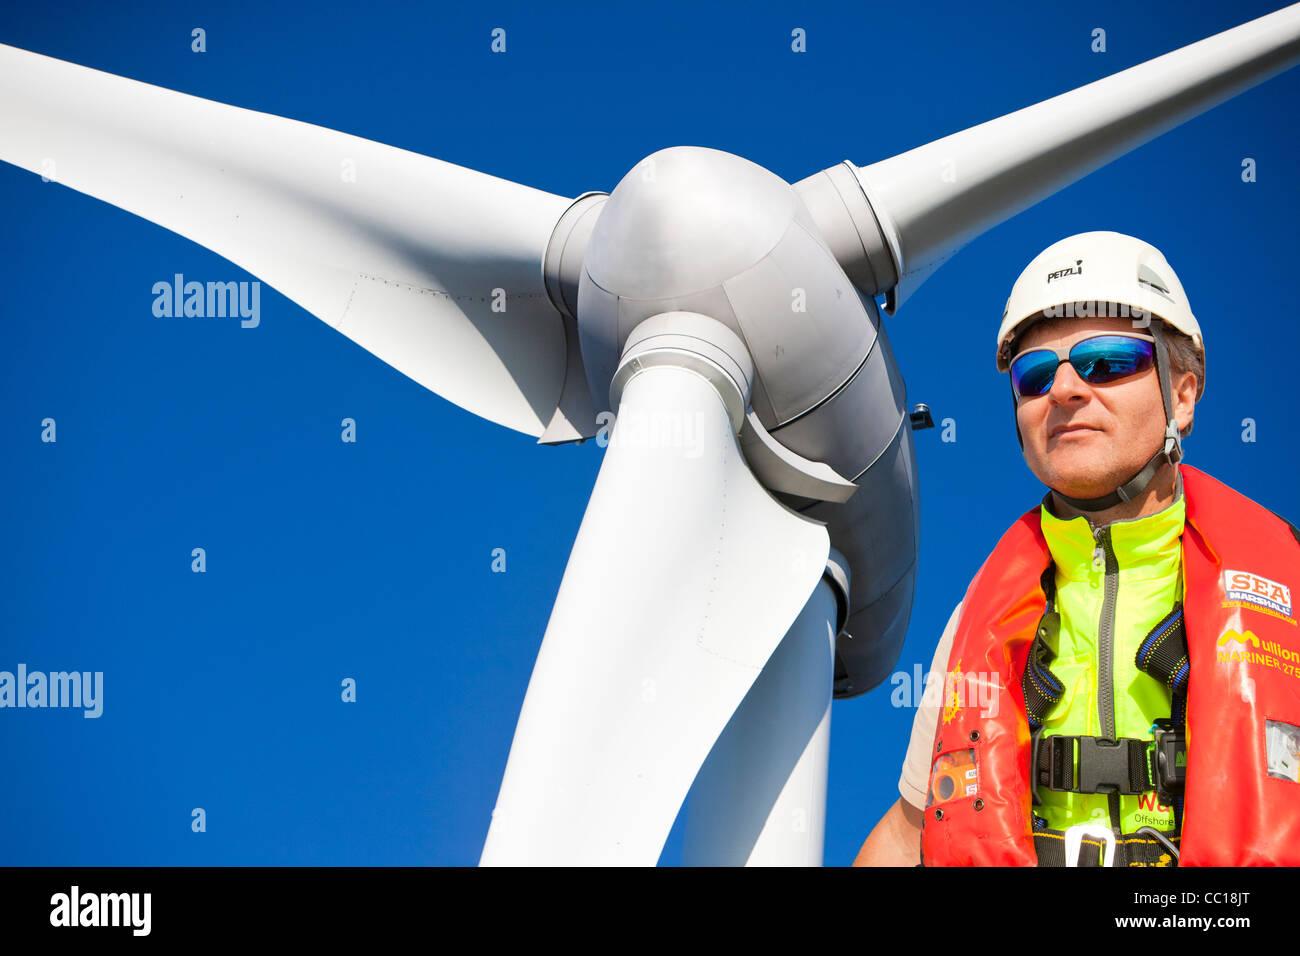 An Enercon 2.3 MW wind turbine on Flotta in the Orkney isles, Scotland, UK. Stock Photo